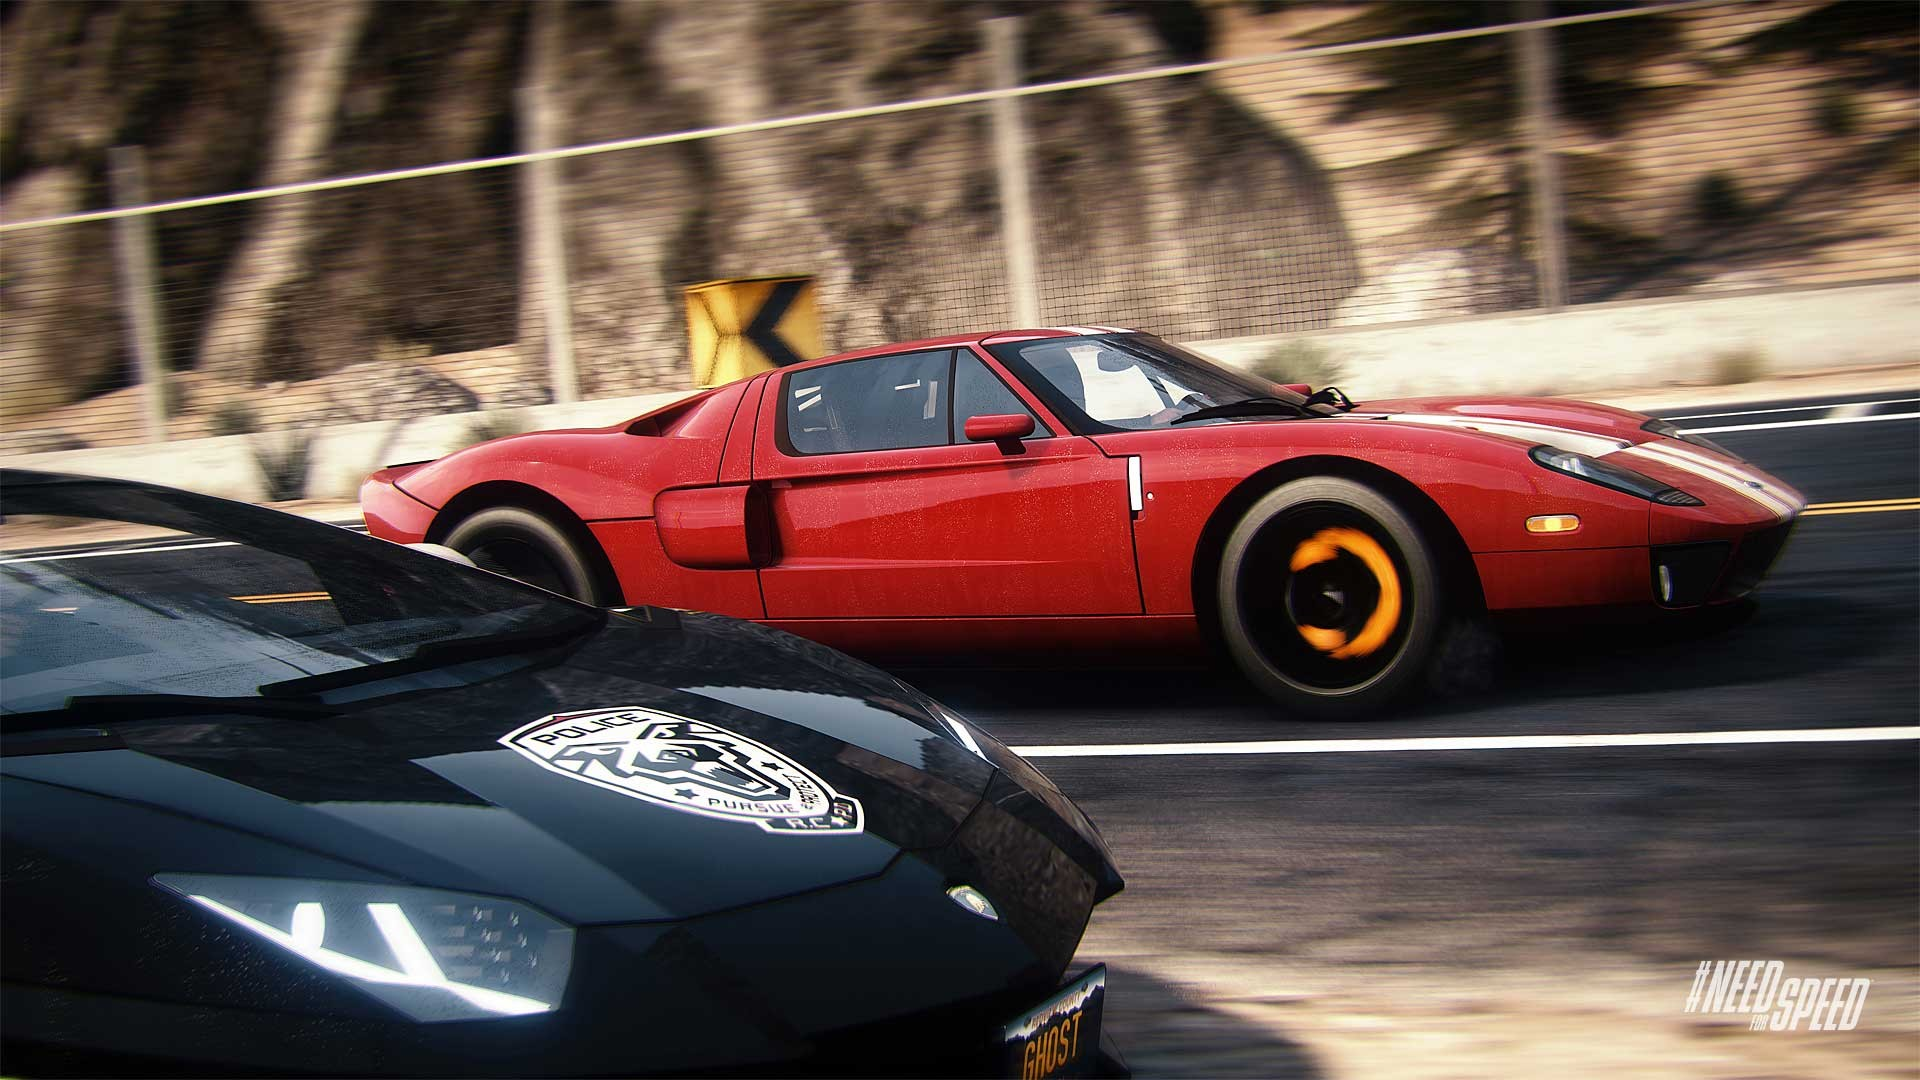 need for speed desktop wallpaper - photo #47